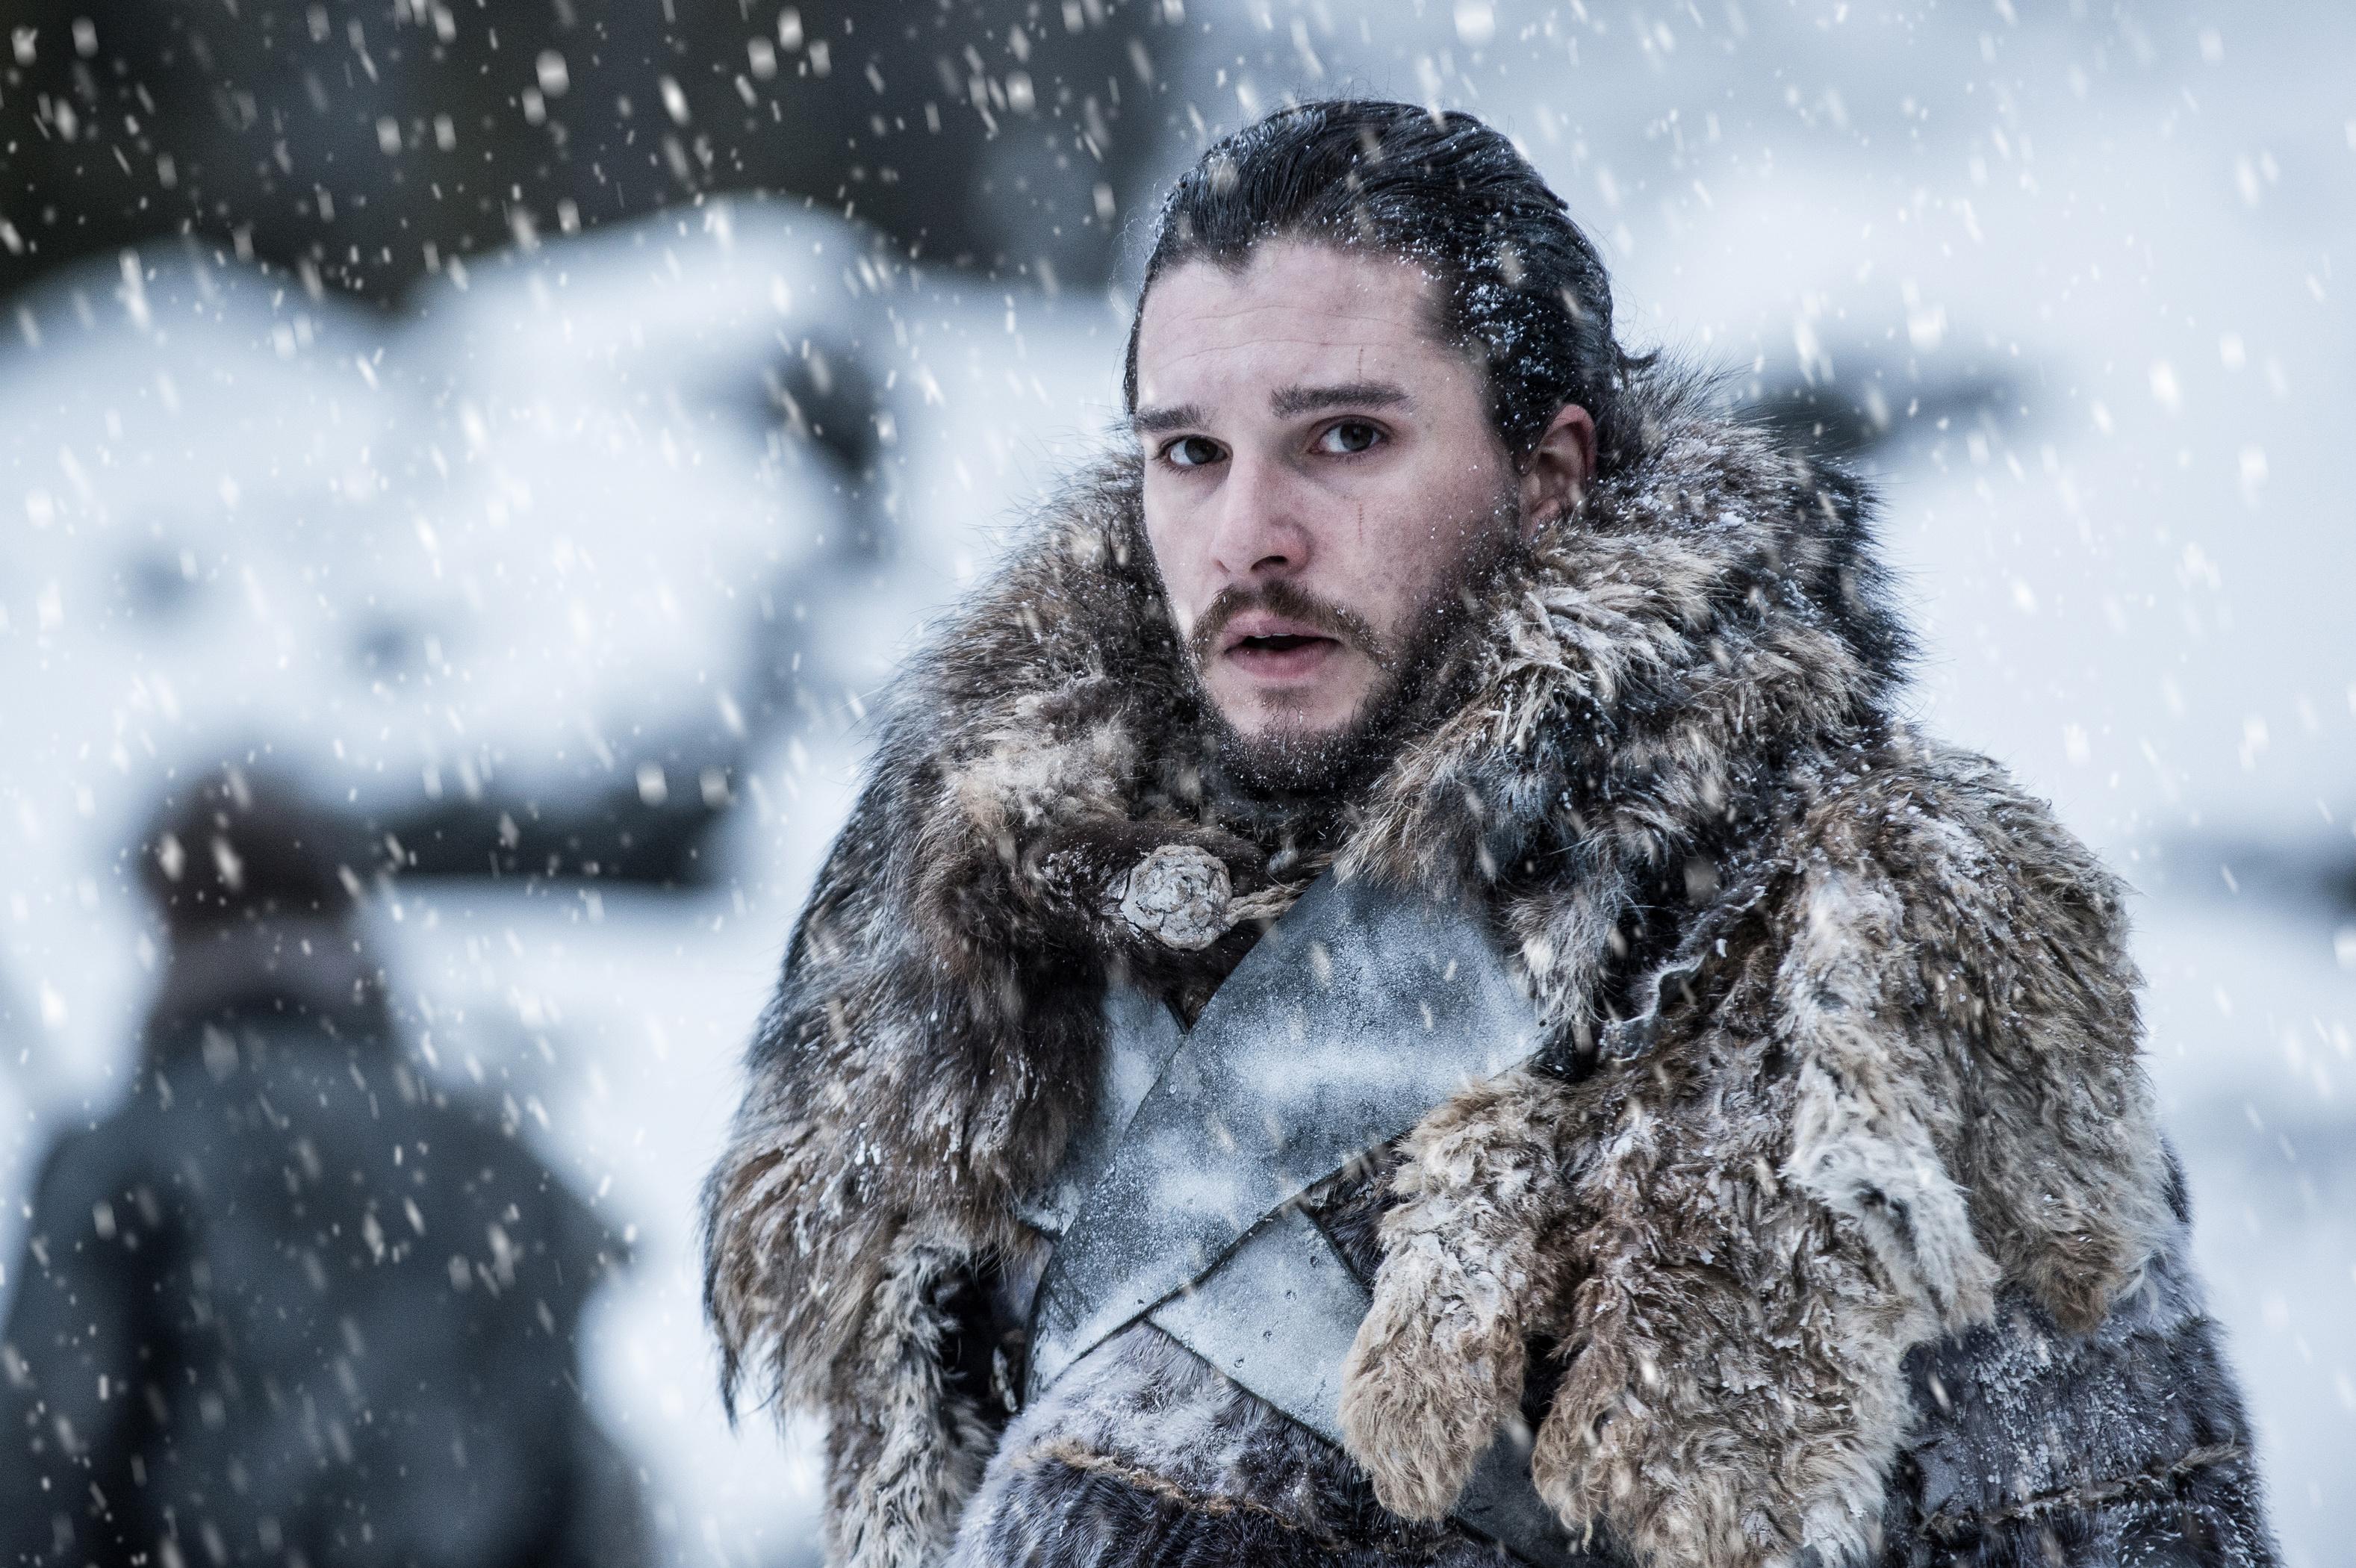 Kit Harington as Jon Snow Game of Thrones